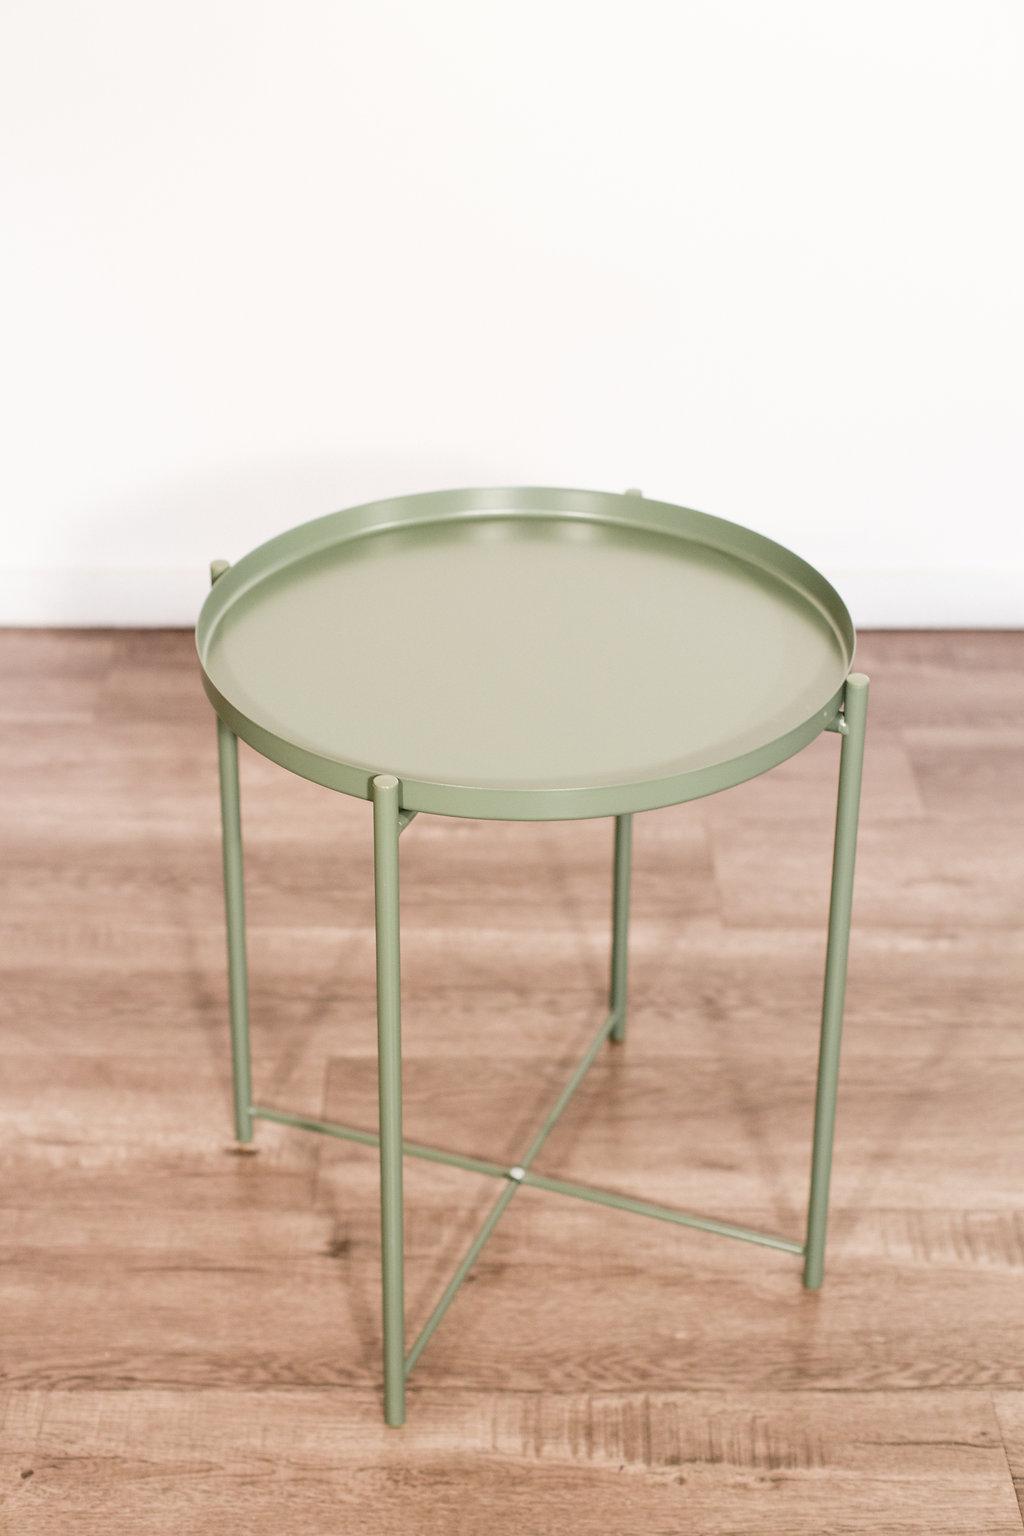 "Green Table 18"" diameter 21"" tall Quantity: 2 Price: $20"